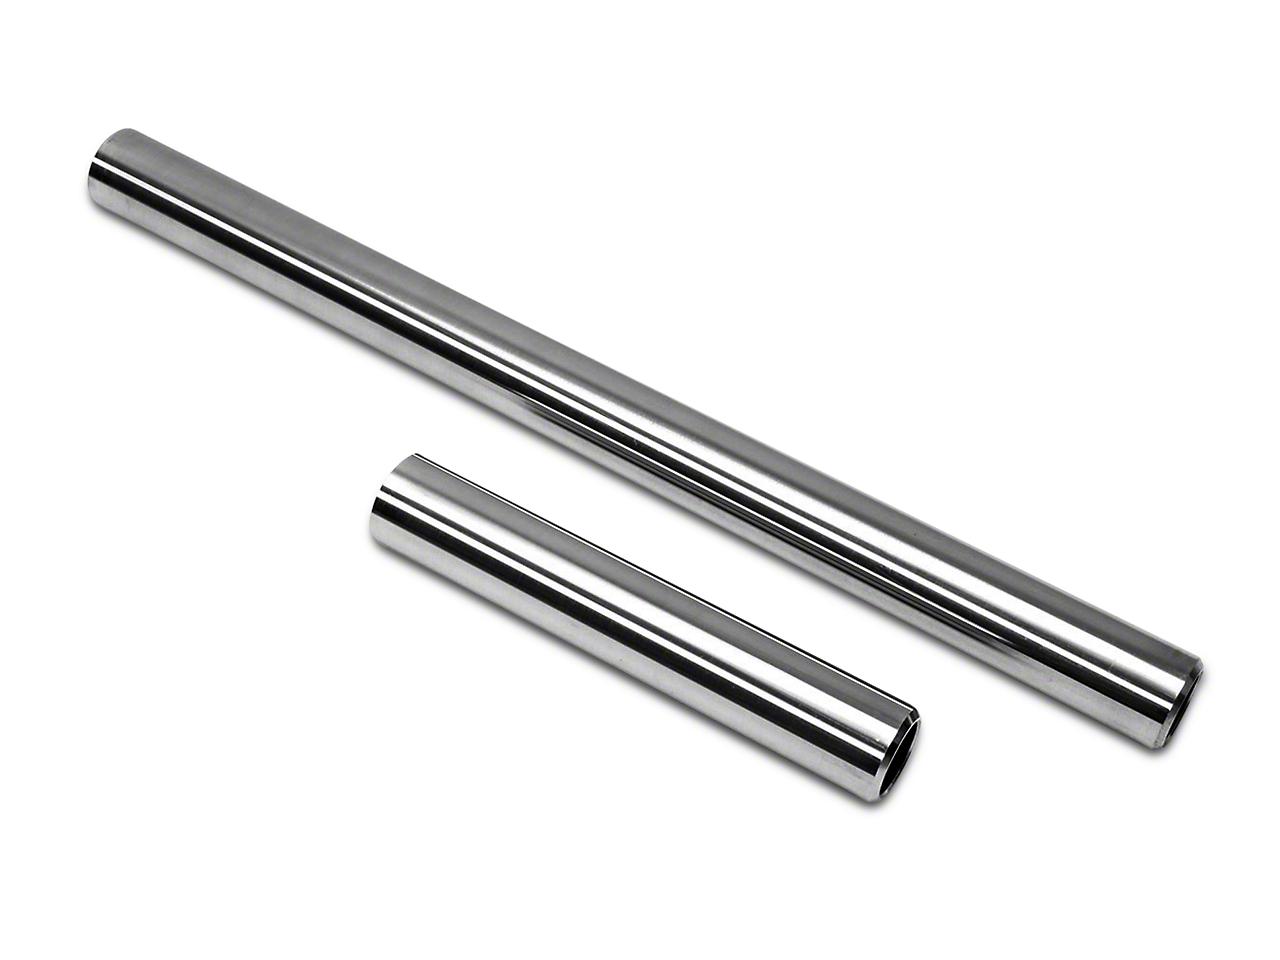 Teraflex Front Axle Sleeve Kit (07-18 Wrangler JK)